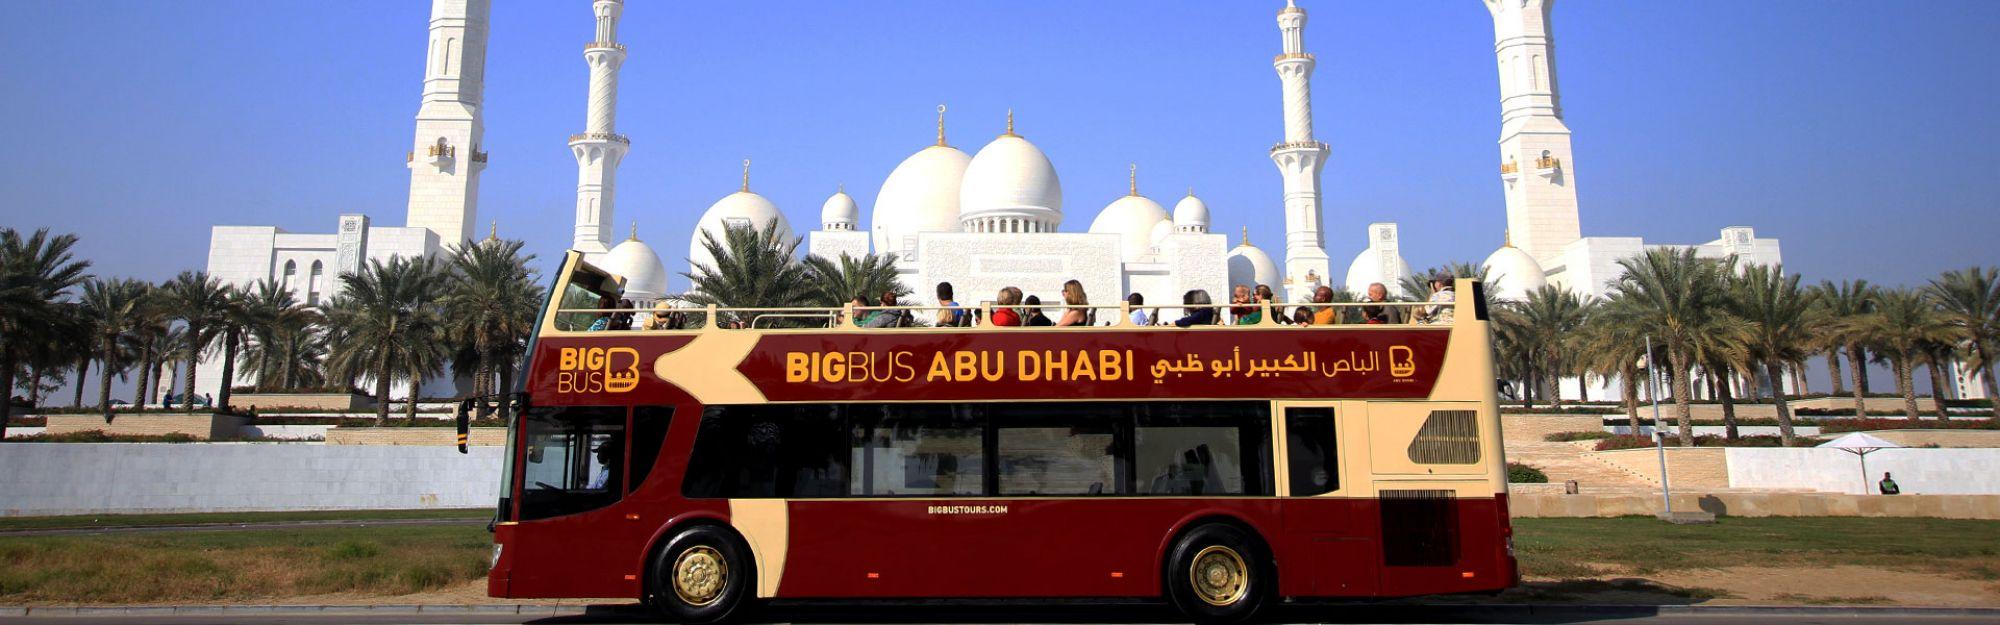 Abu Dhabi Classic Ticket